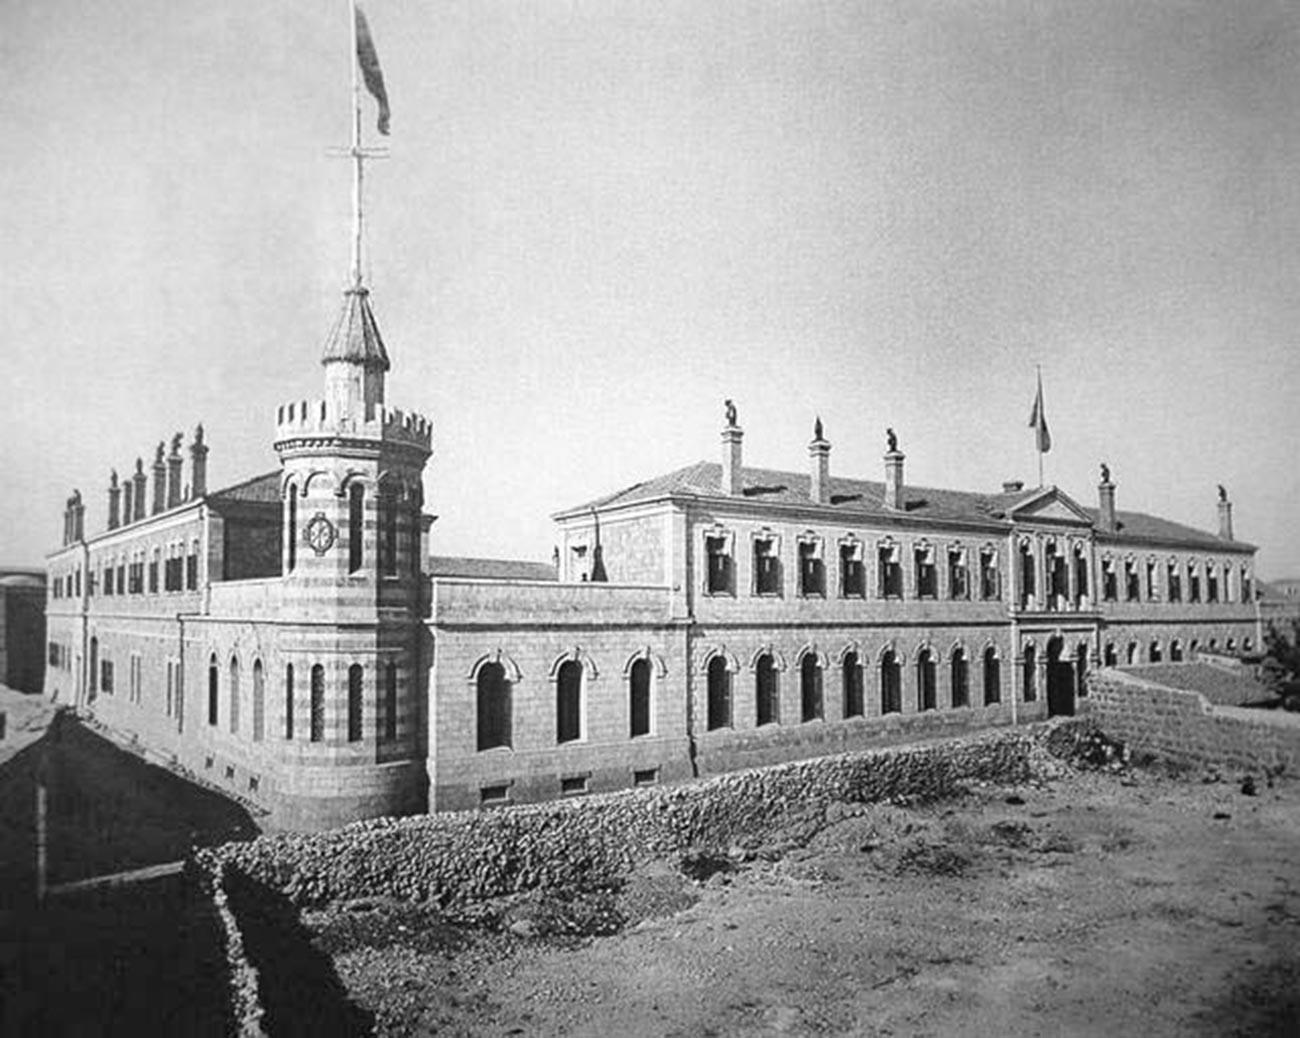 Sergei Courtyard of the Imperial Orthodox Palestine Society in Jerusalem,1889